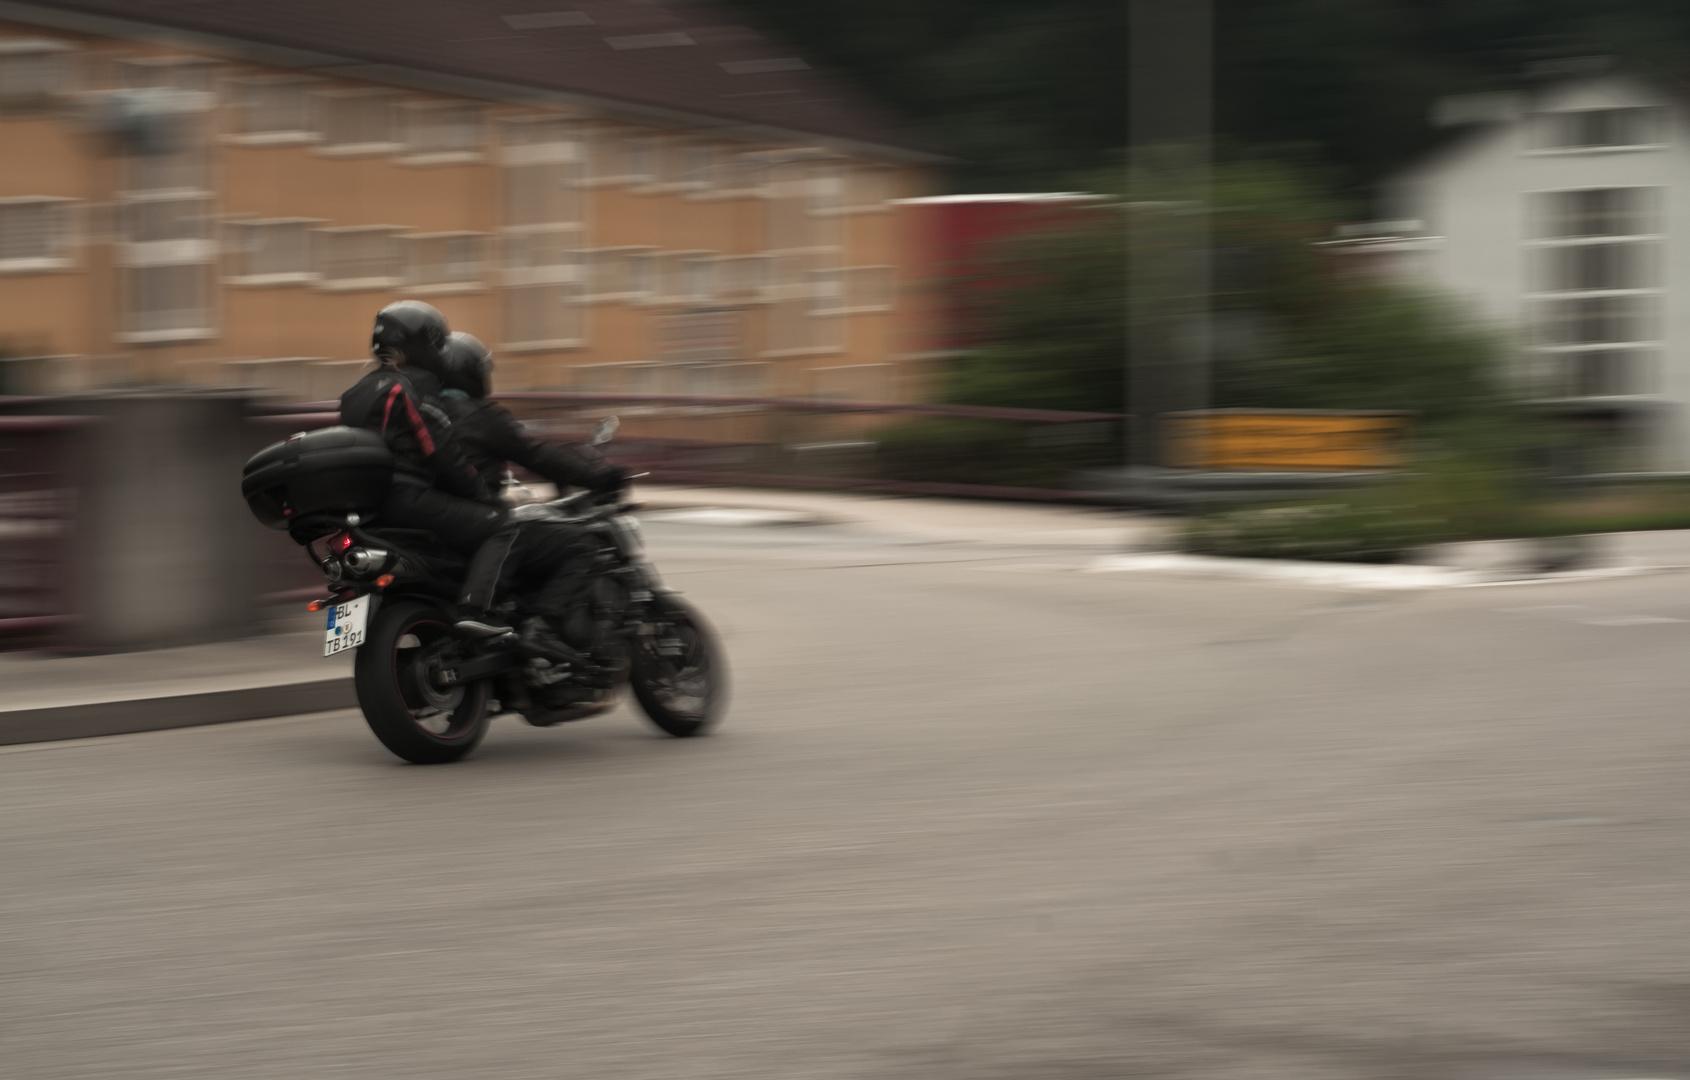 Life at 50mm - pair biking